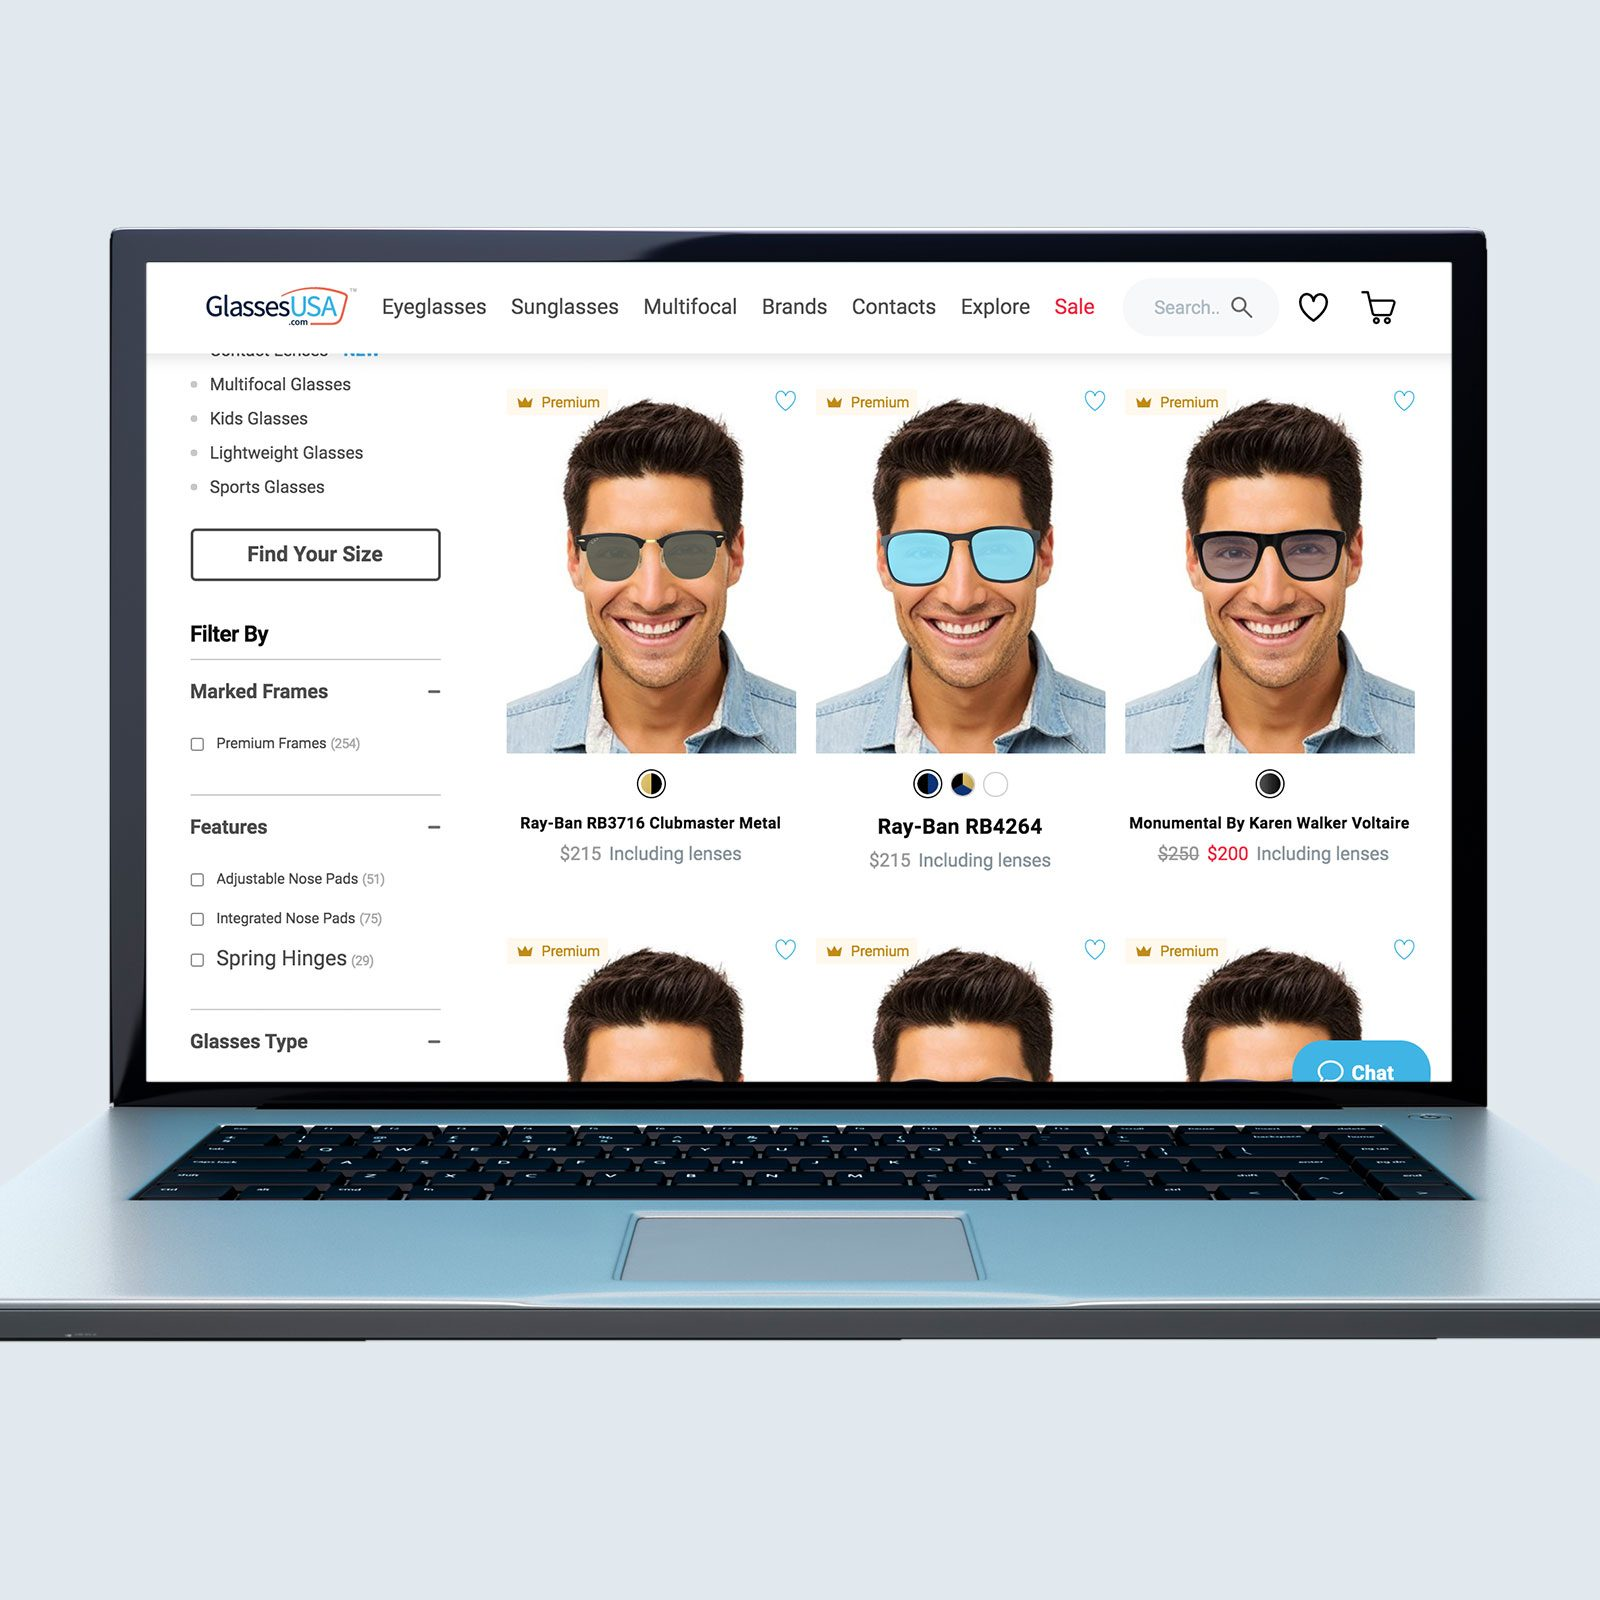 GlassesUSA Polarized Sunglasses